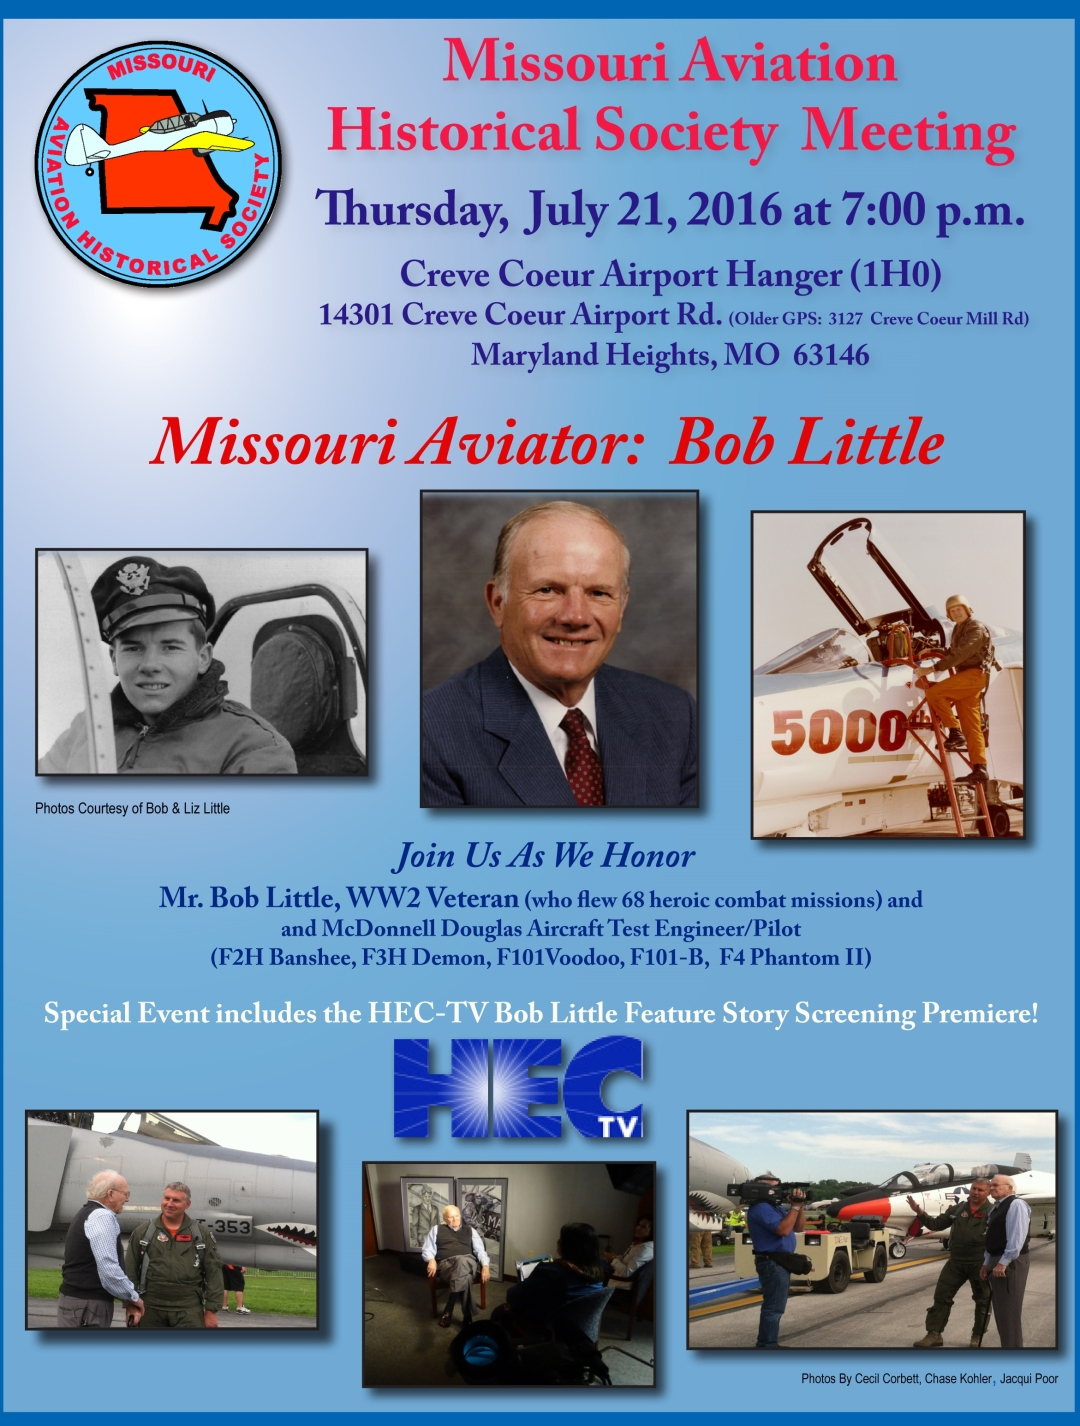 2016 07 21 Bob Little Tribute Mtg Flyer